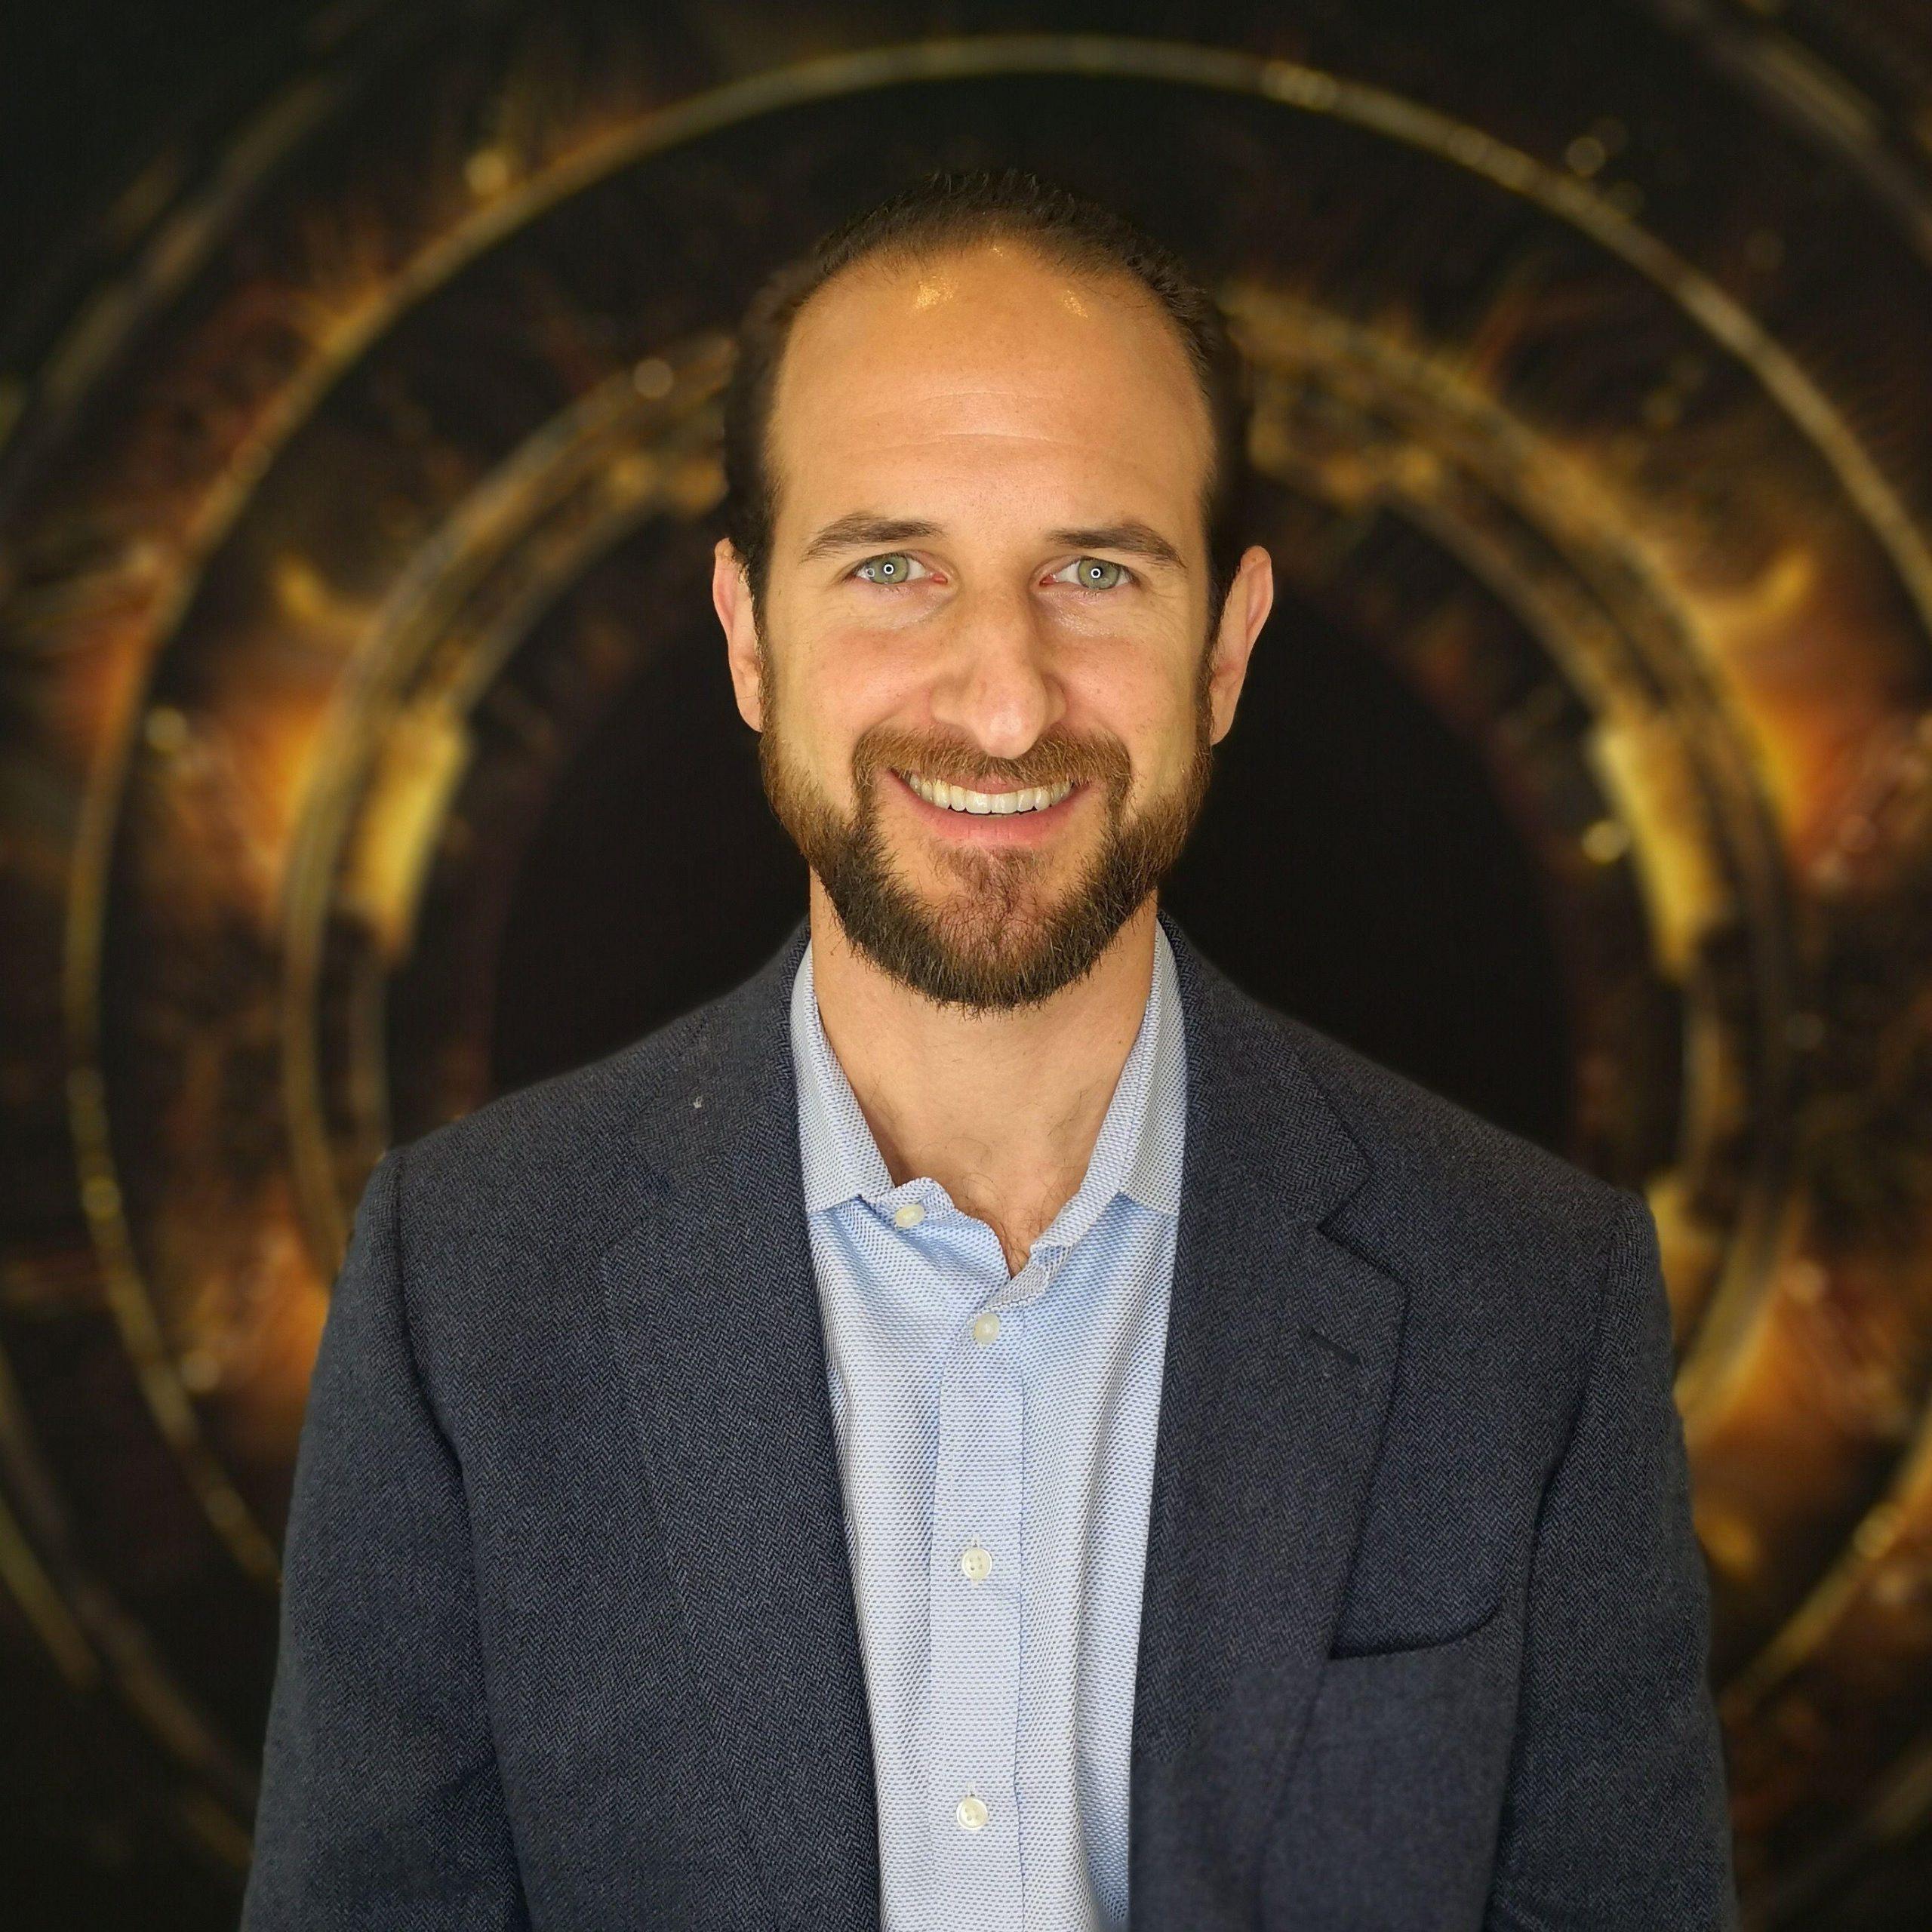 Brett Goldberg Co-Founder & Co-CEO, TickPick